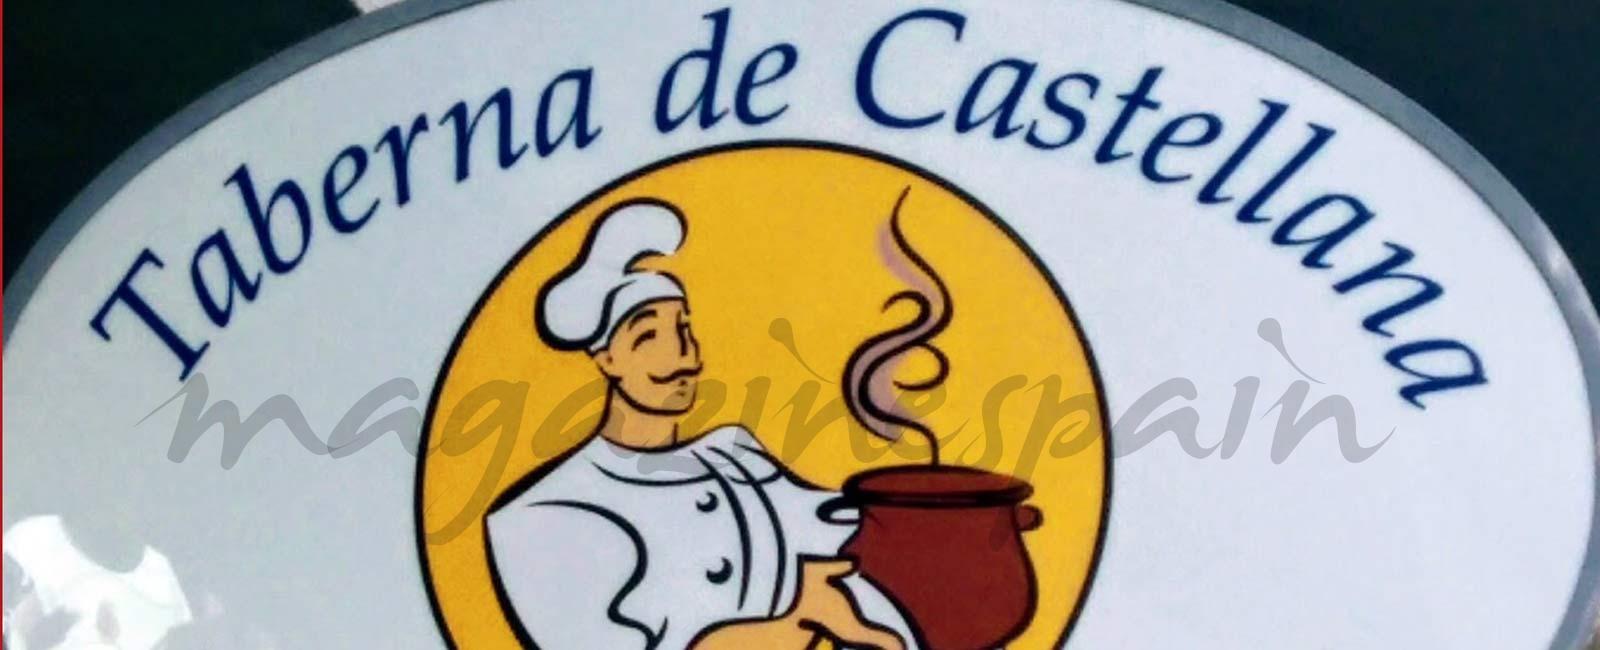 Taberna de Castellana